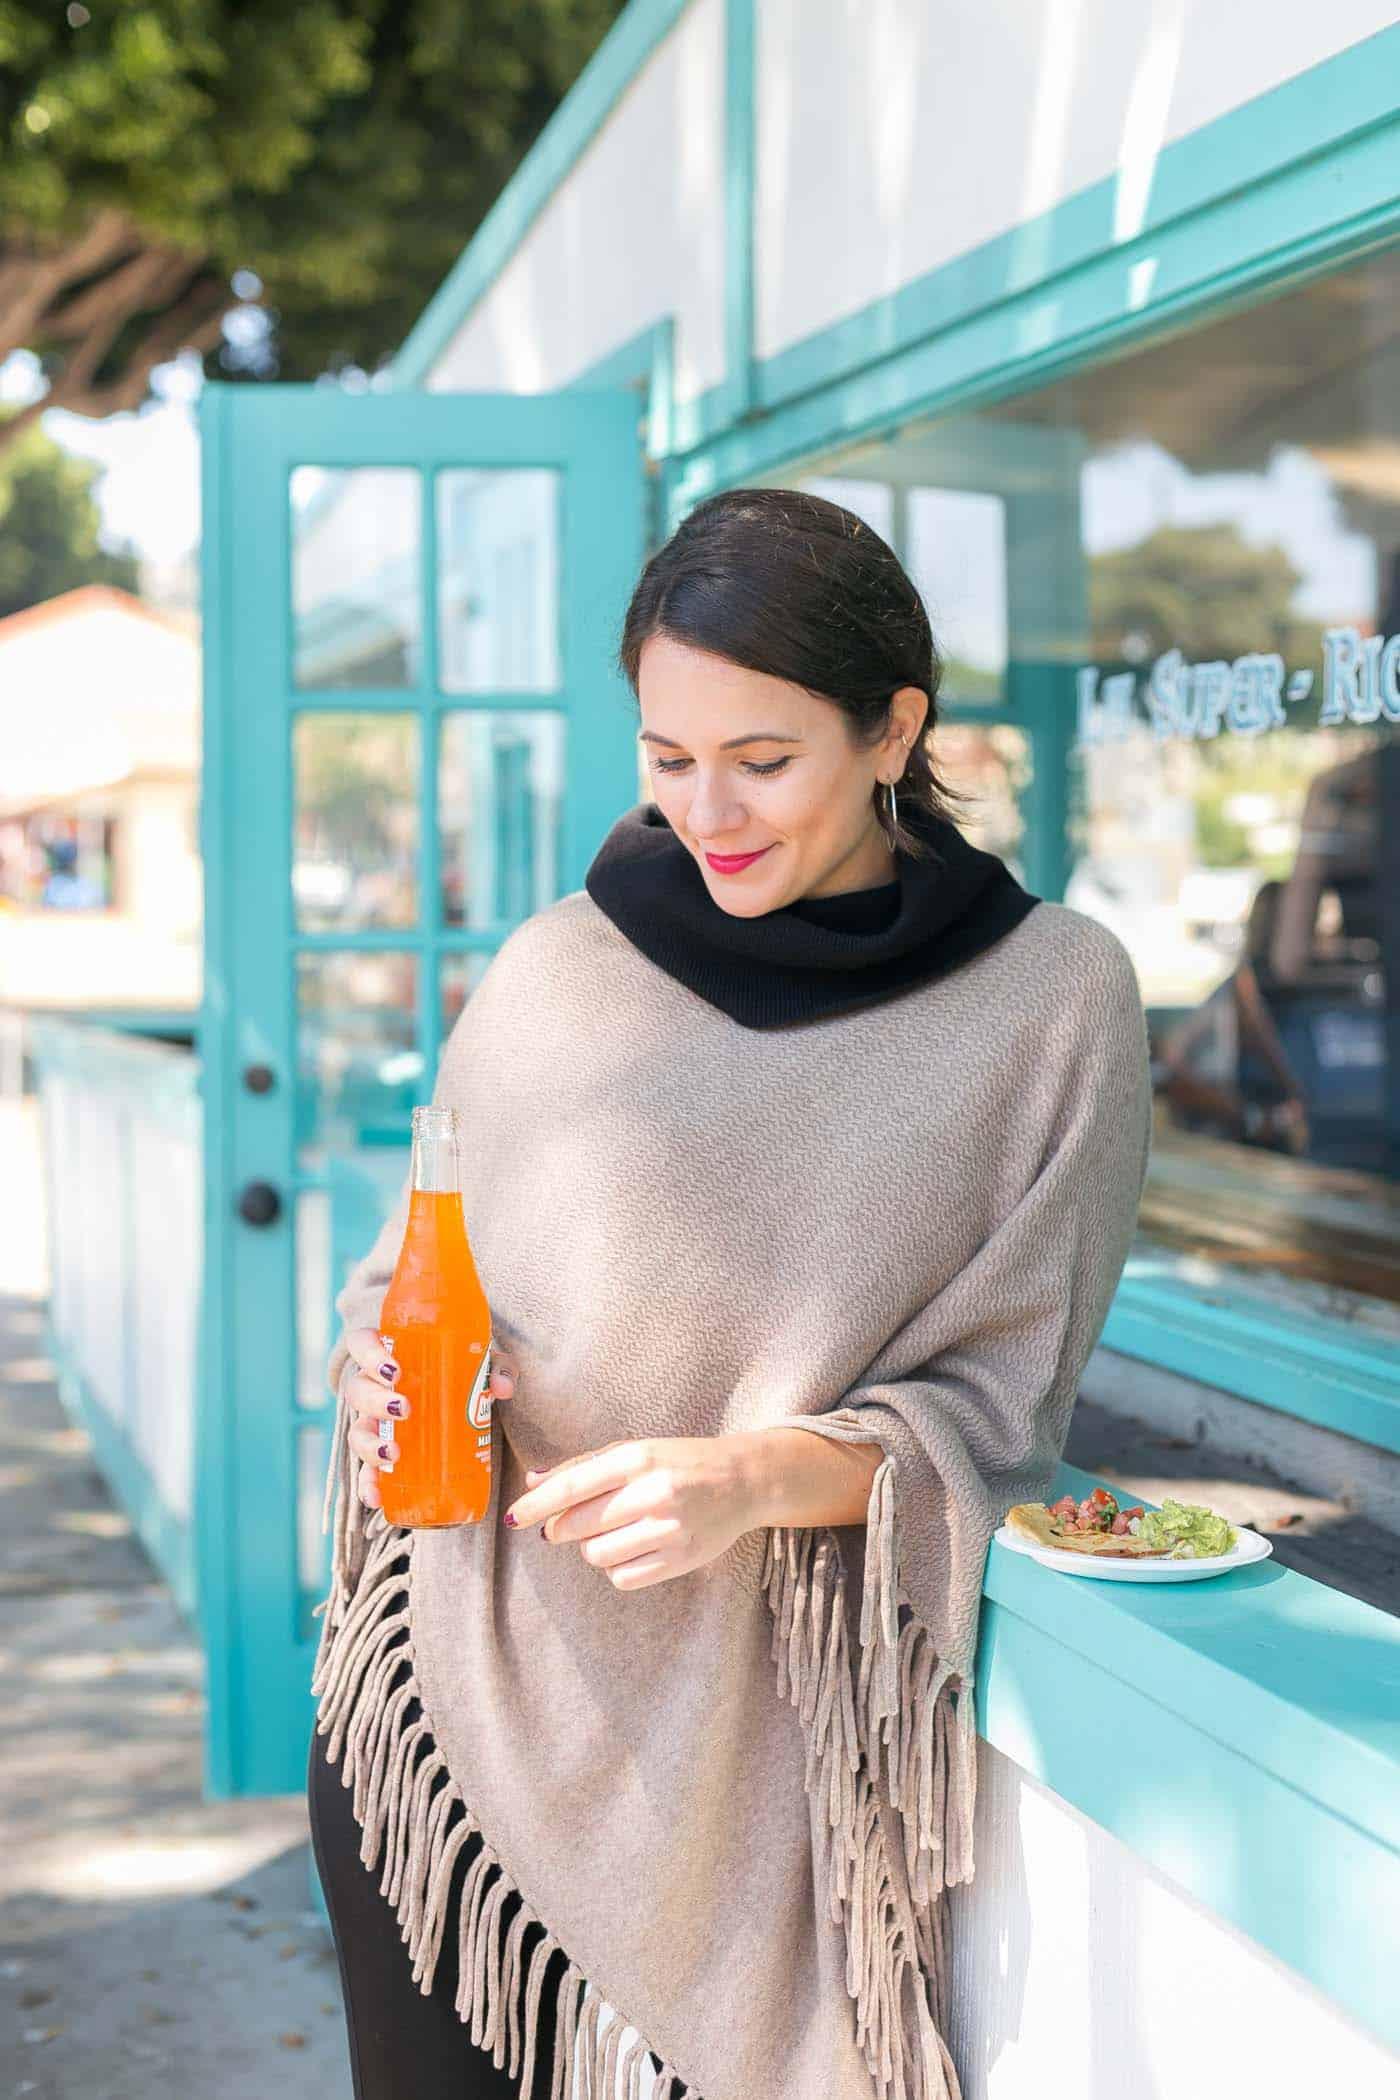 best tacos in Santa Barbara - My Style Vita @mystylevita